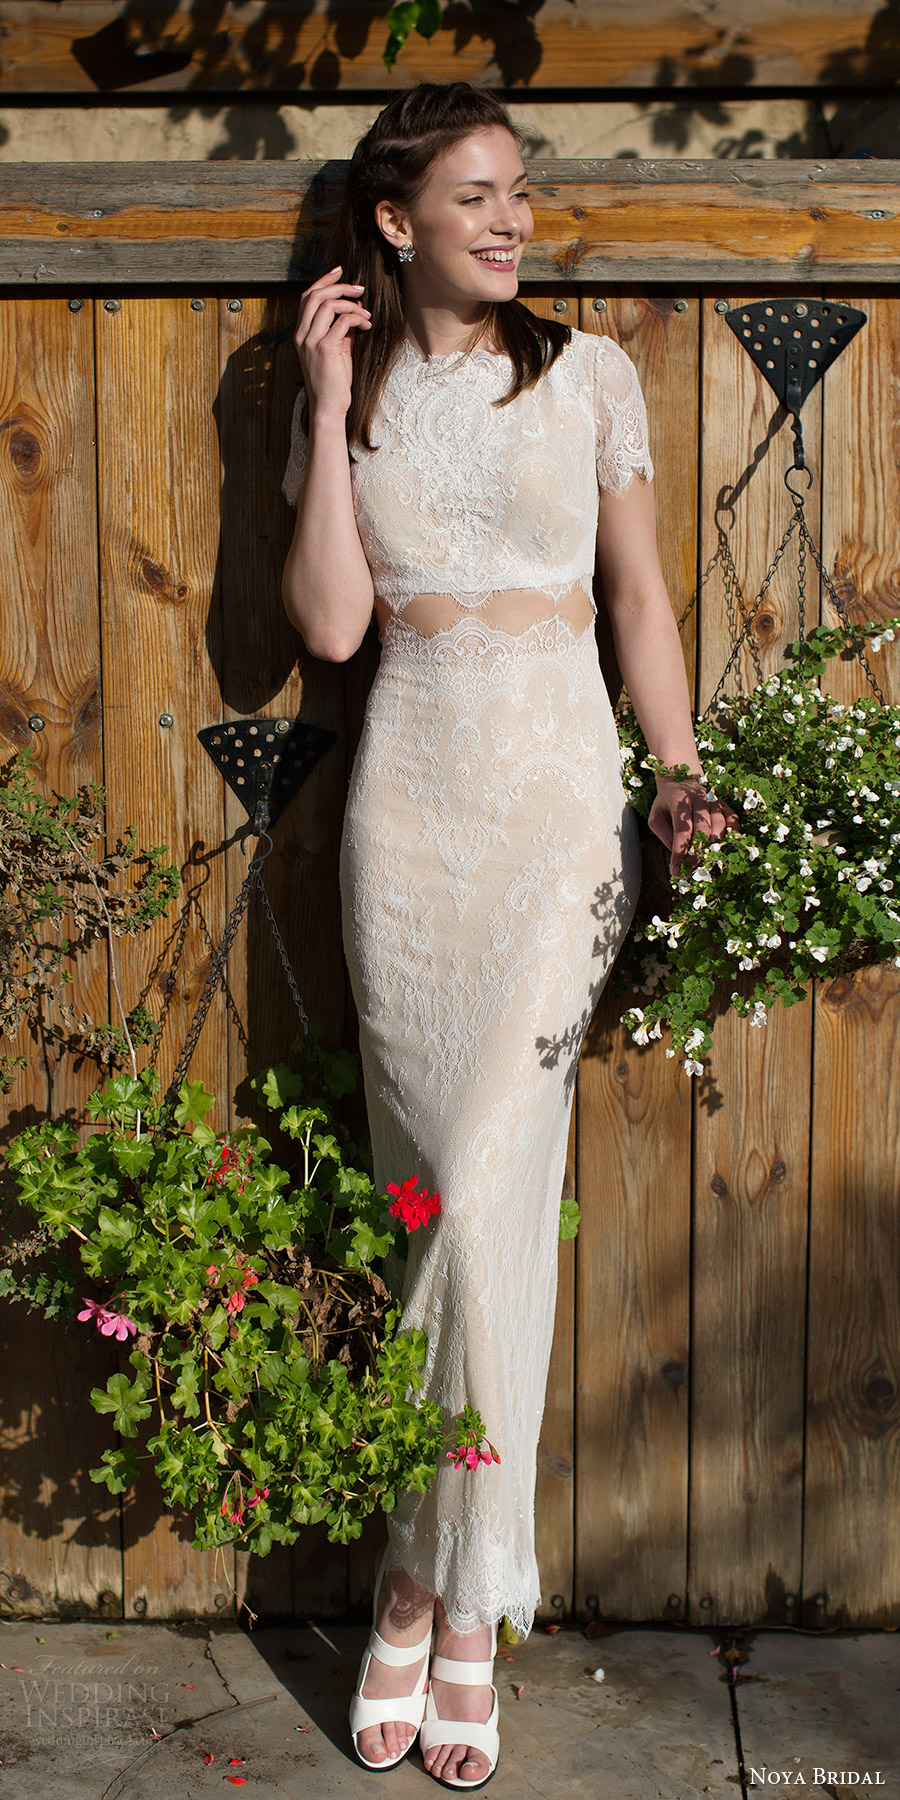 noya bridal 2016 short sleeves jewel neck sheath lace wedding dress (1213) mv edgy crop top